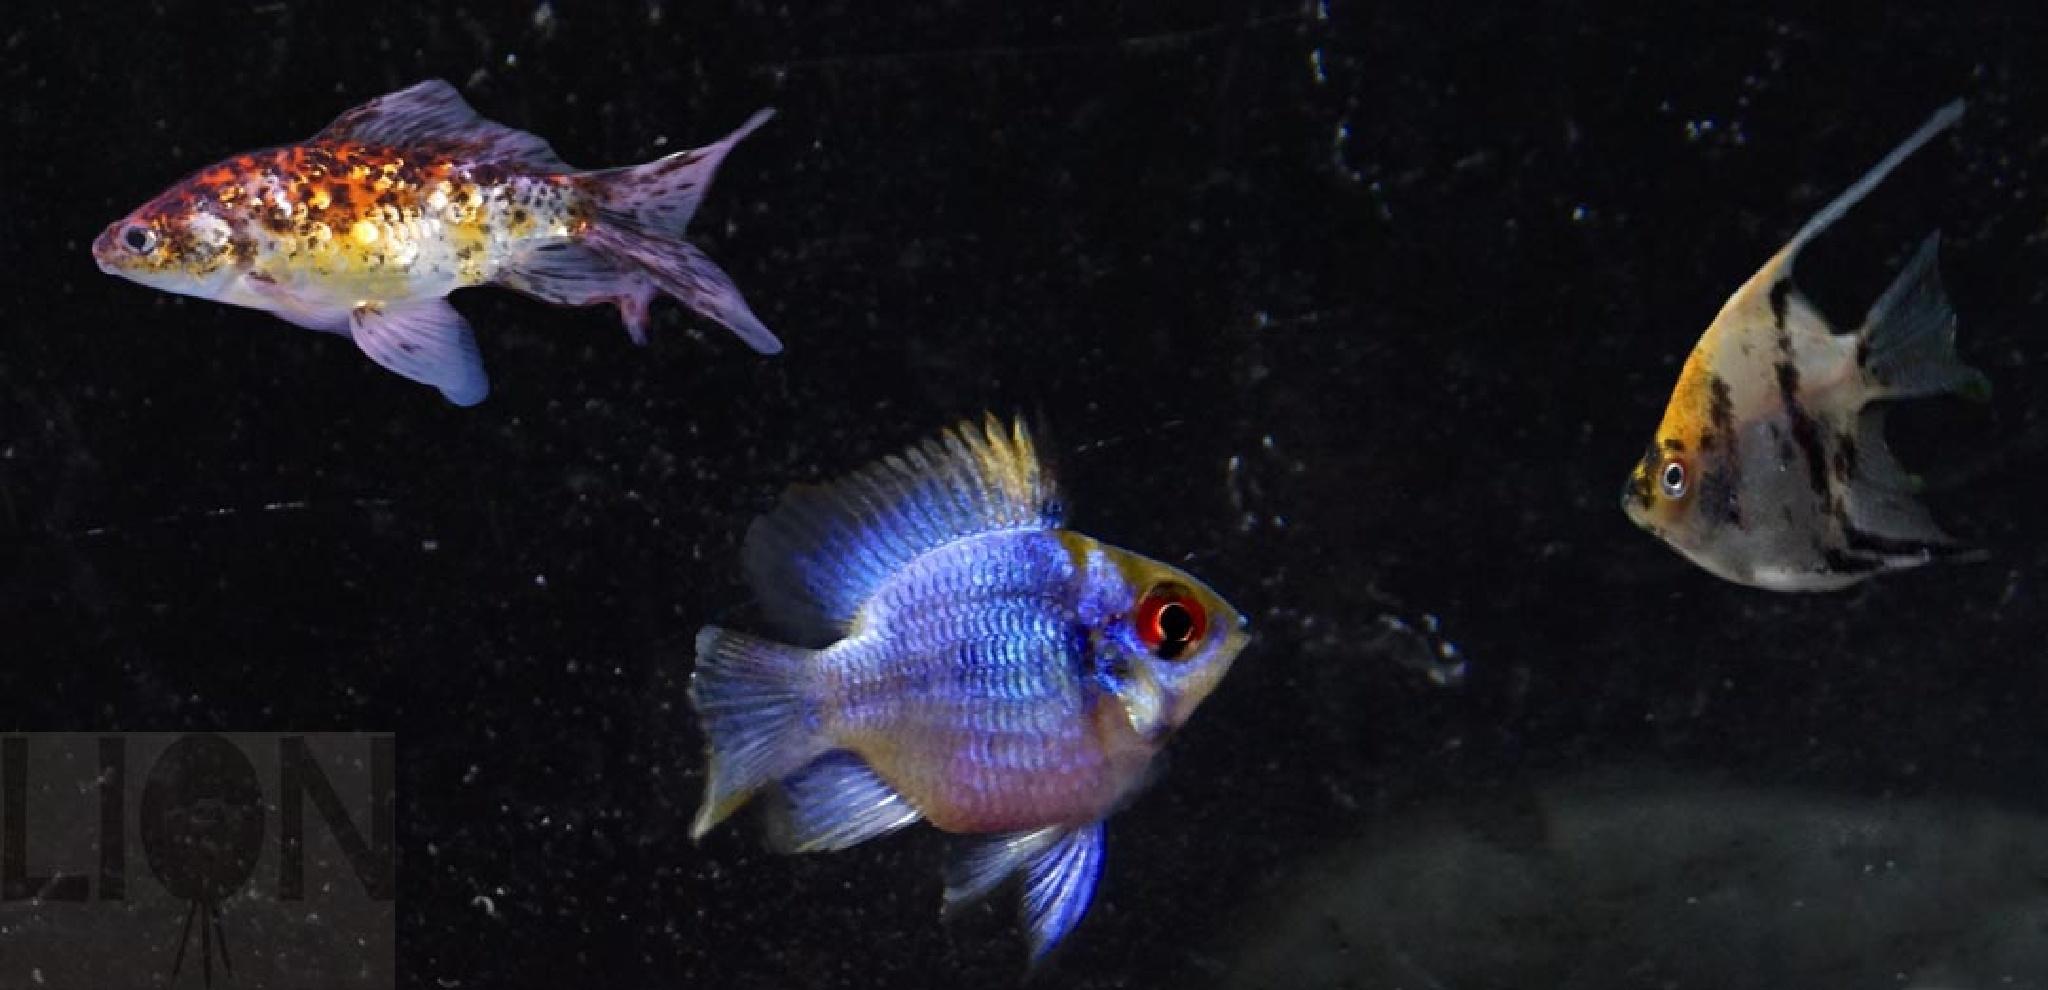 Aquarium by Barry Phillips